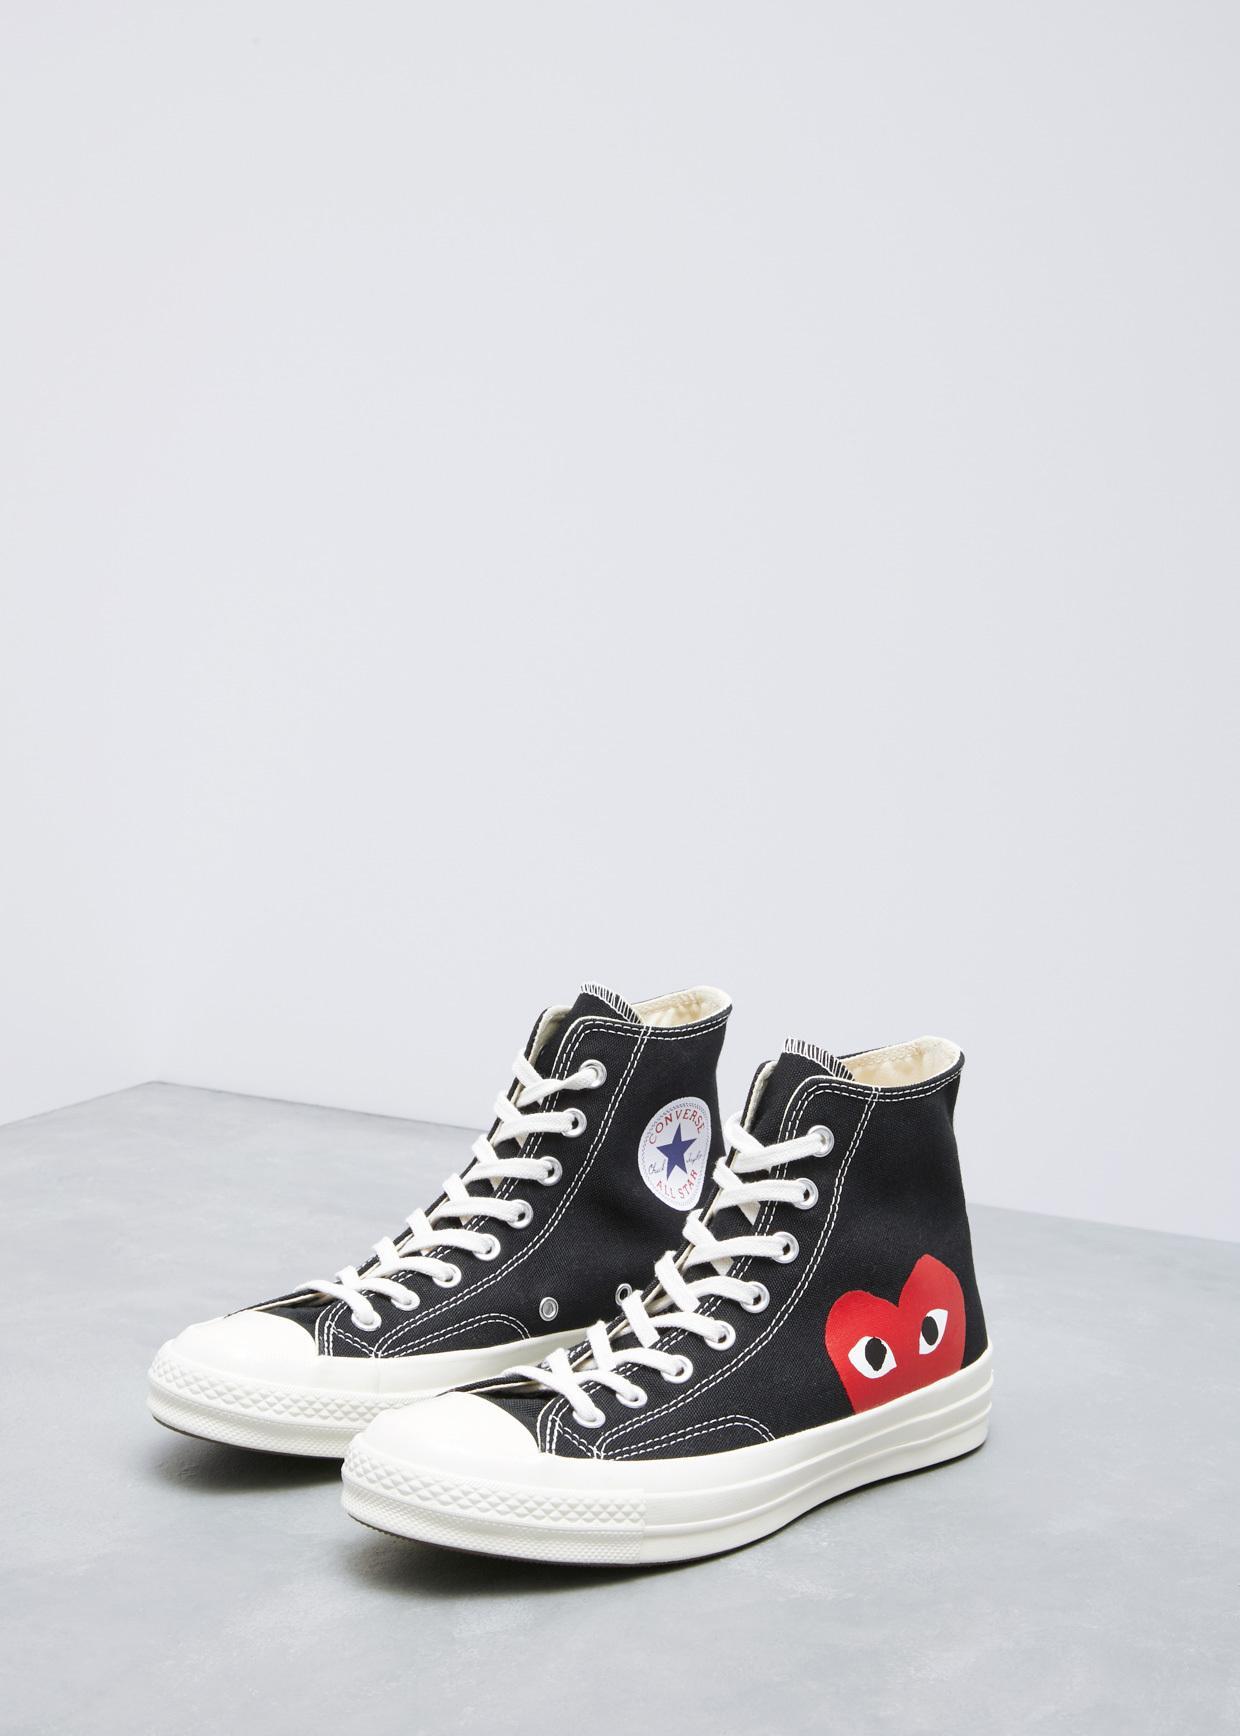 Finn Comfort Shoes New York City